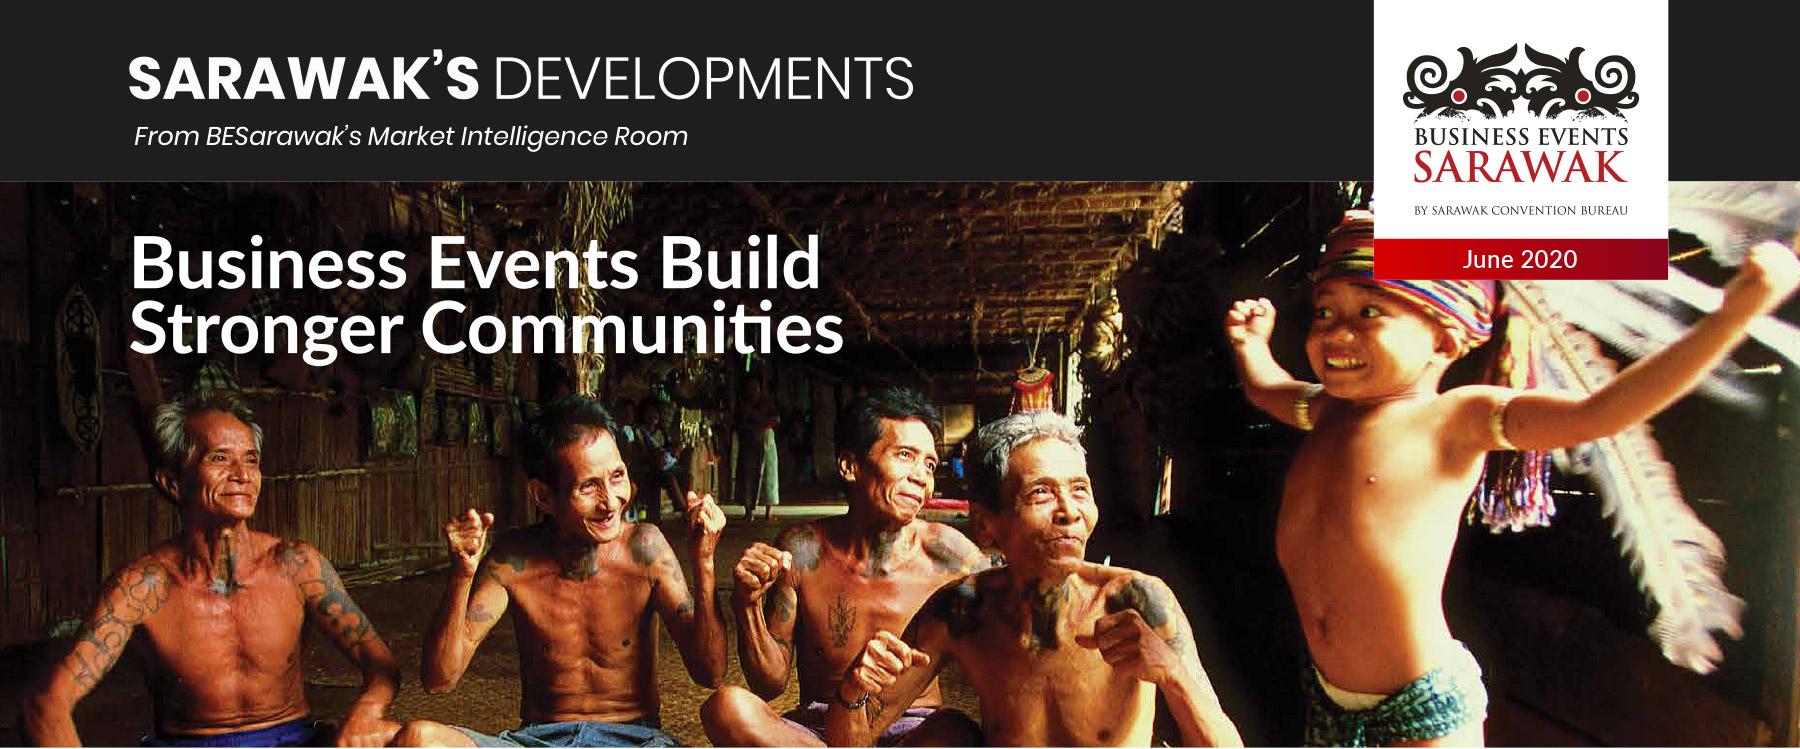 OSarawak Industry Development News – Jun 2020